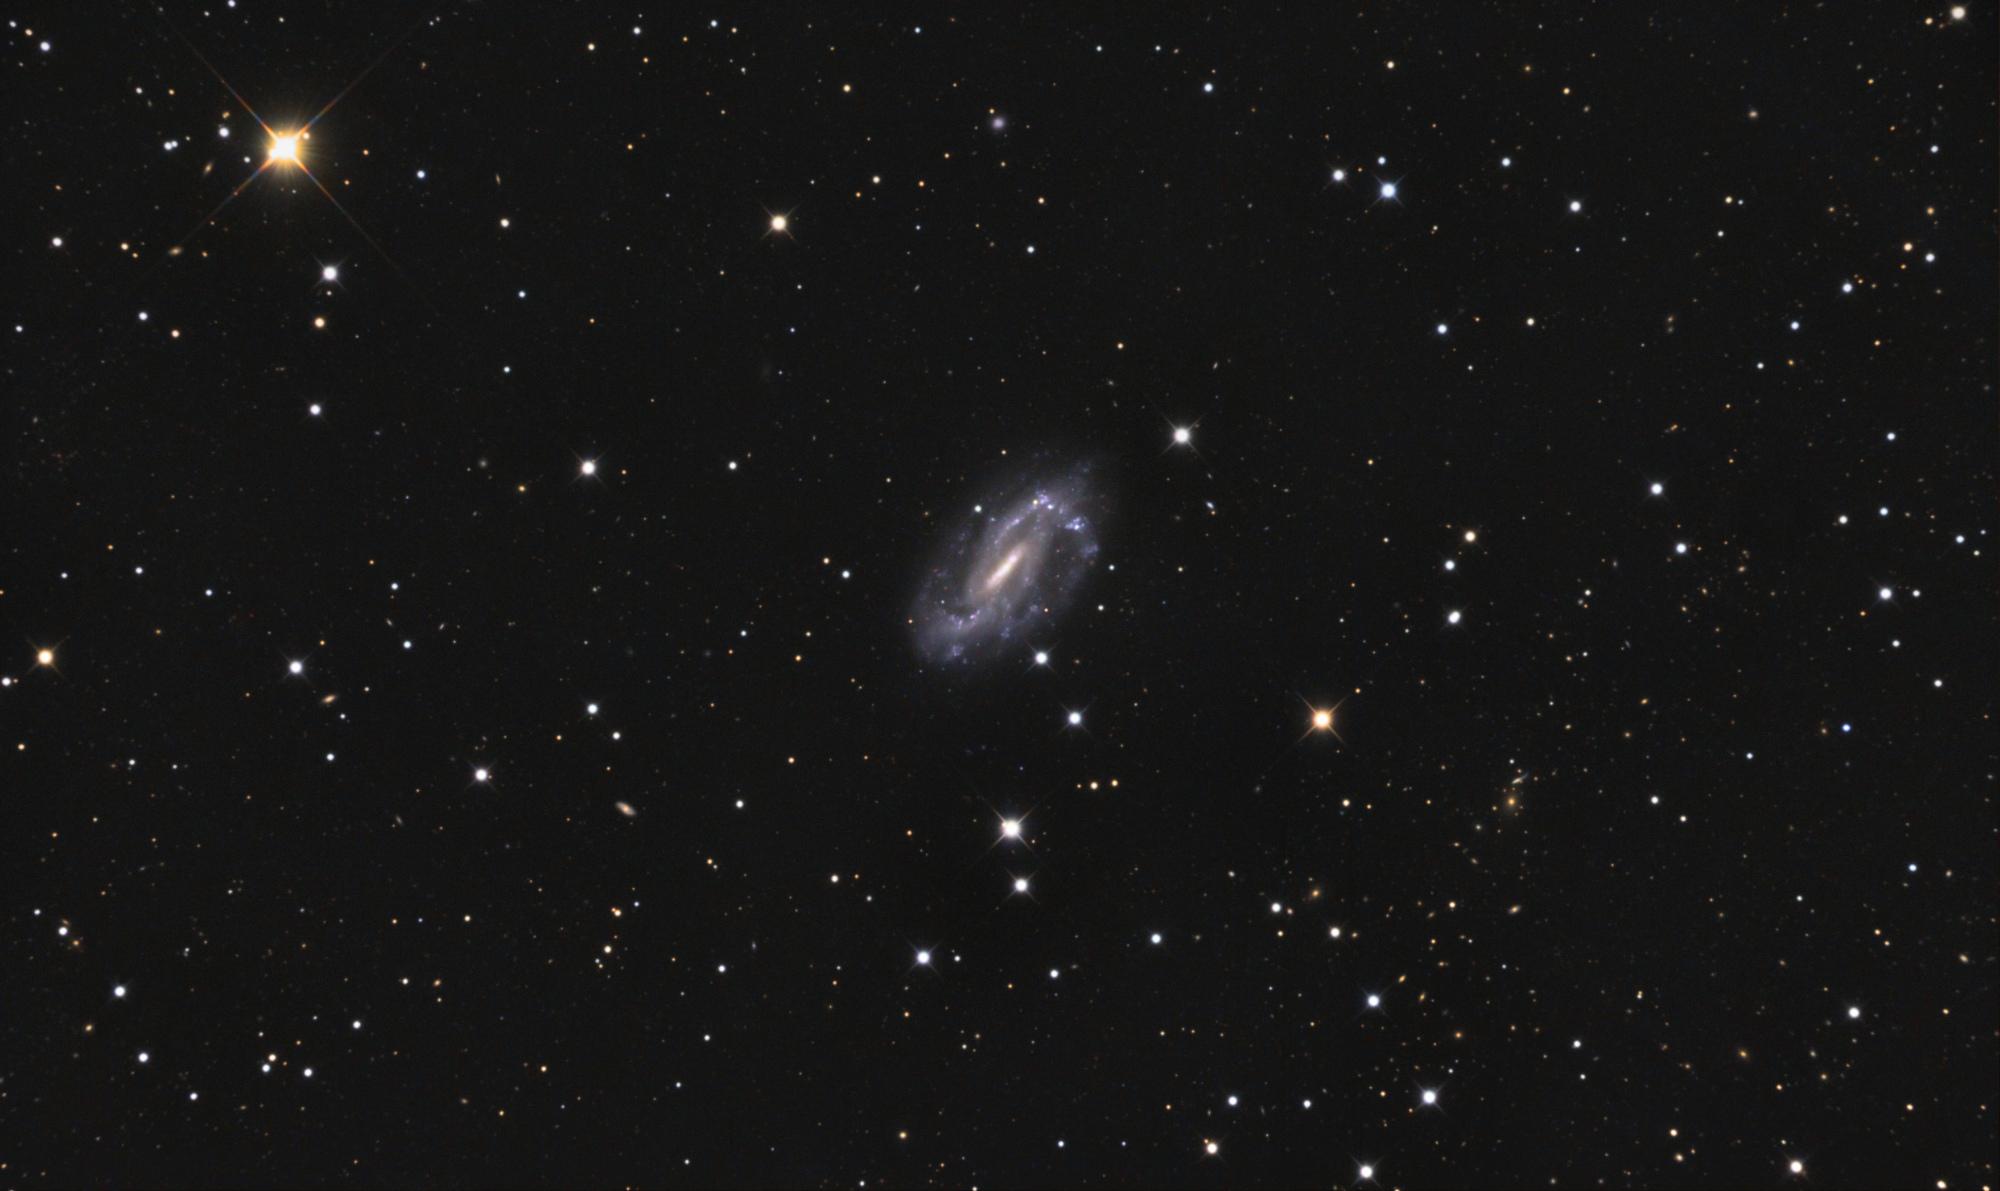 NGC3319-LRVB-Final-V4.jpg